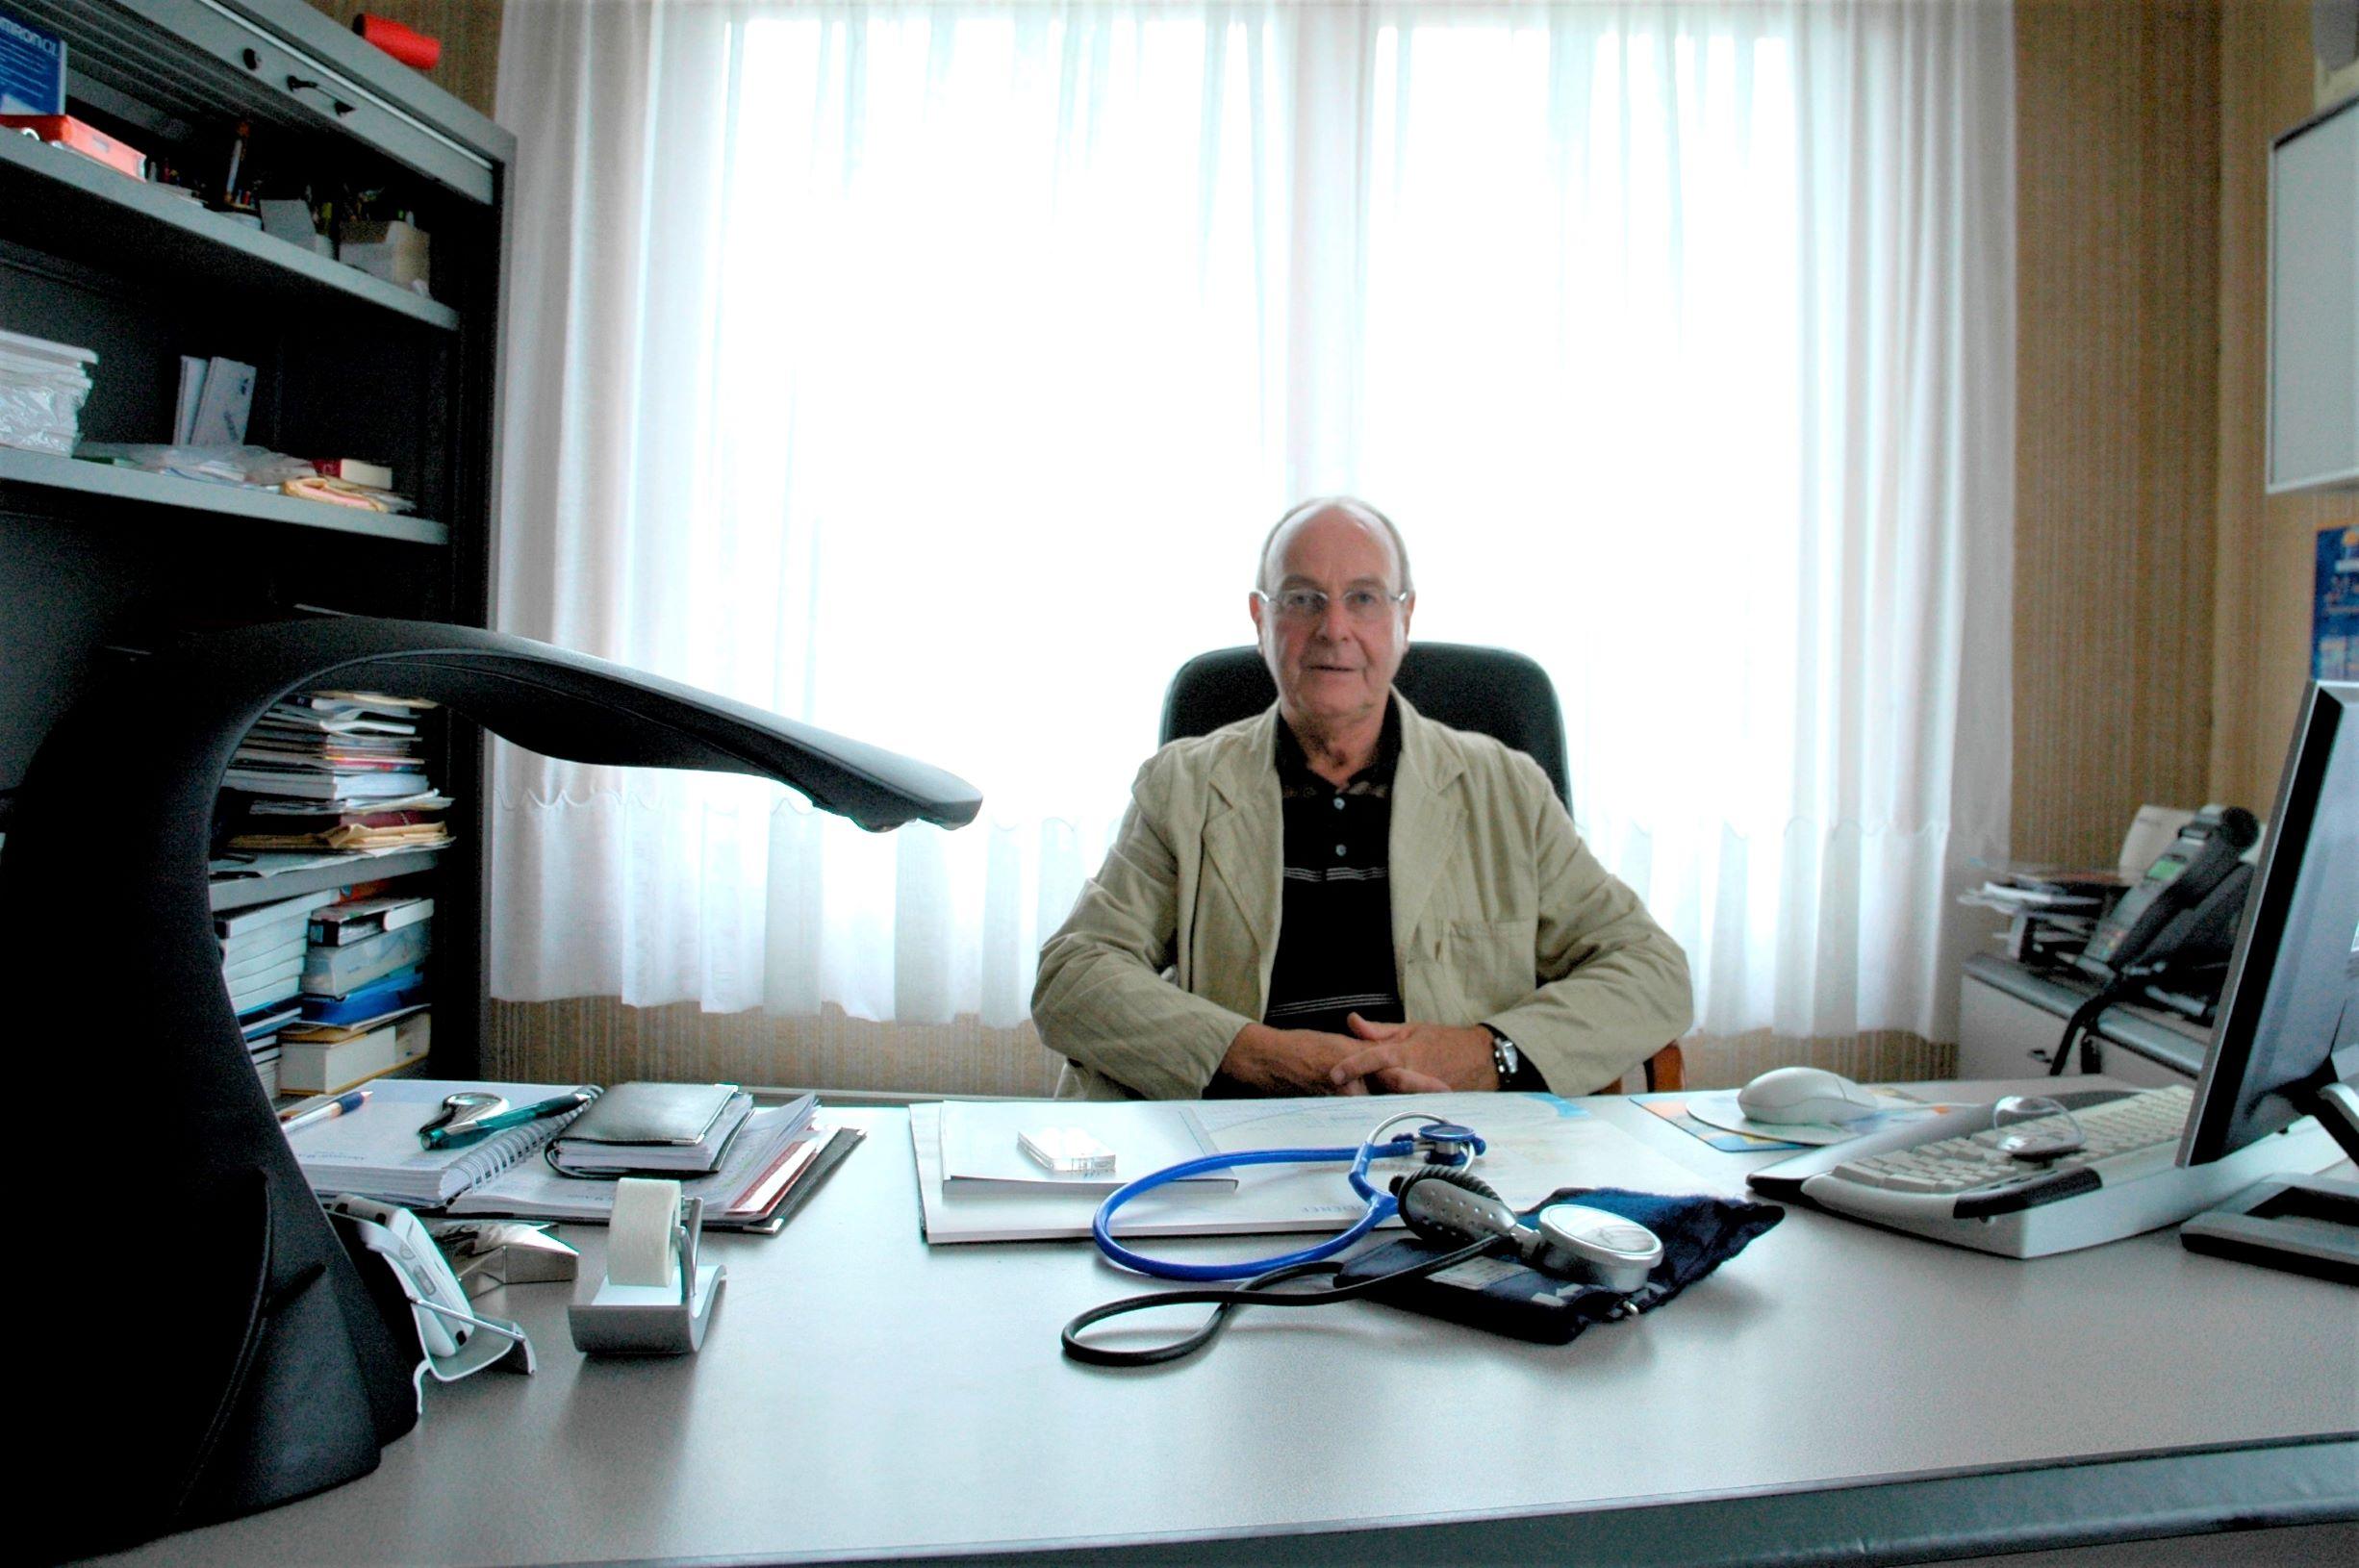 Pierre_Denys_bureau.JPG